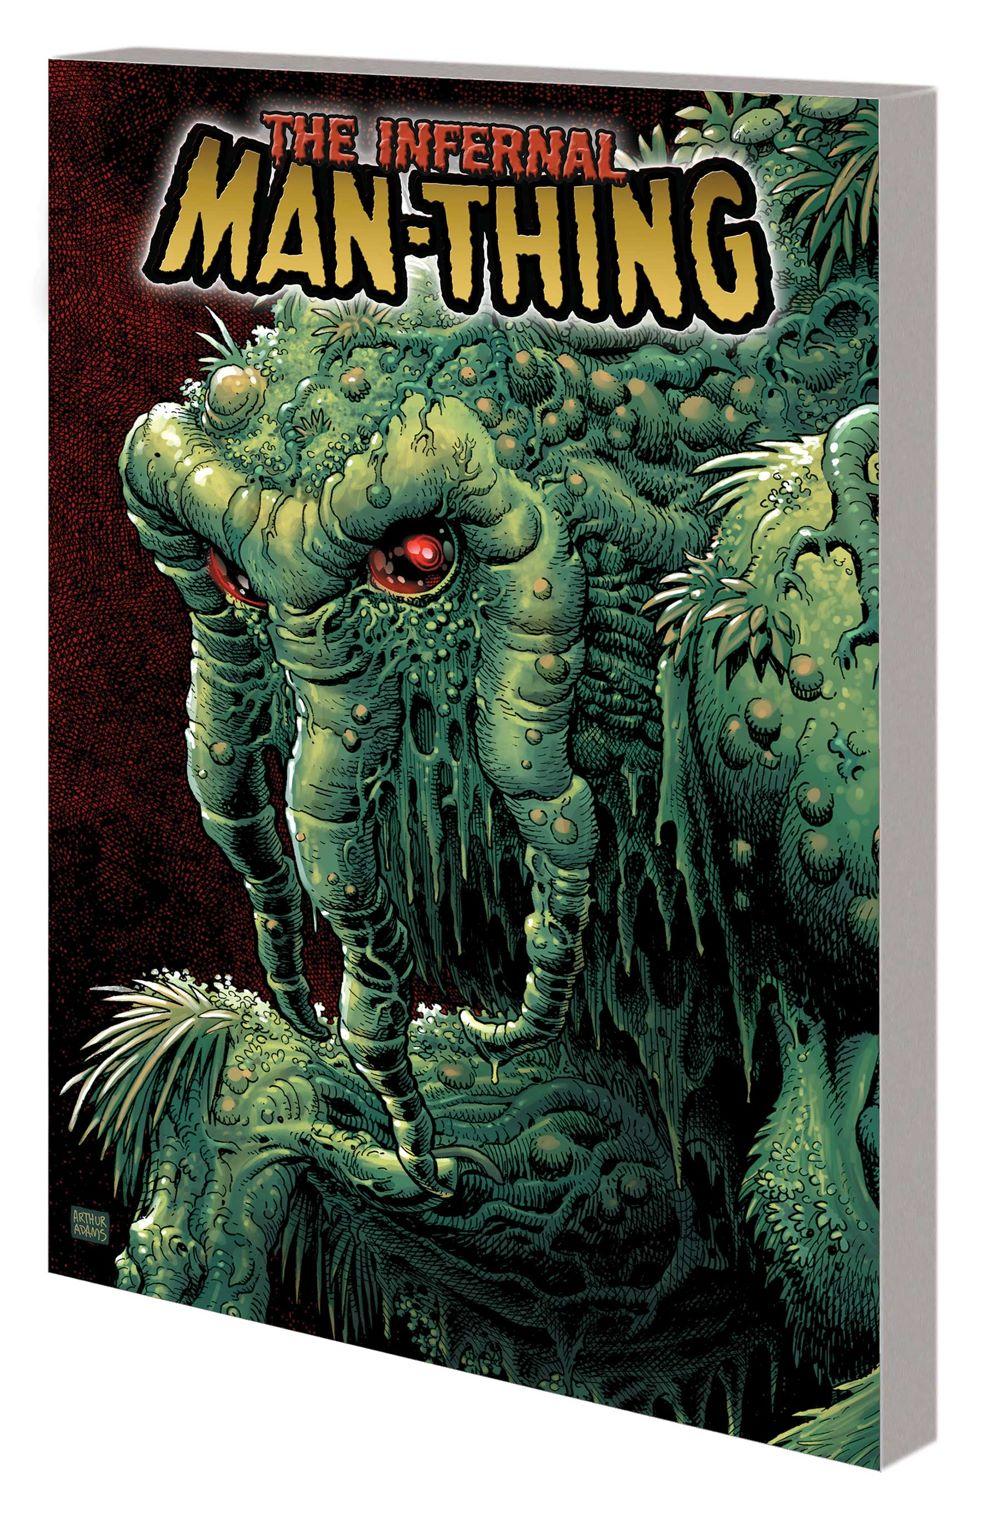 MANTHING_CC_VOL_3_TPB Marvel Comics January 2021 Solicitations